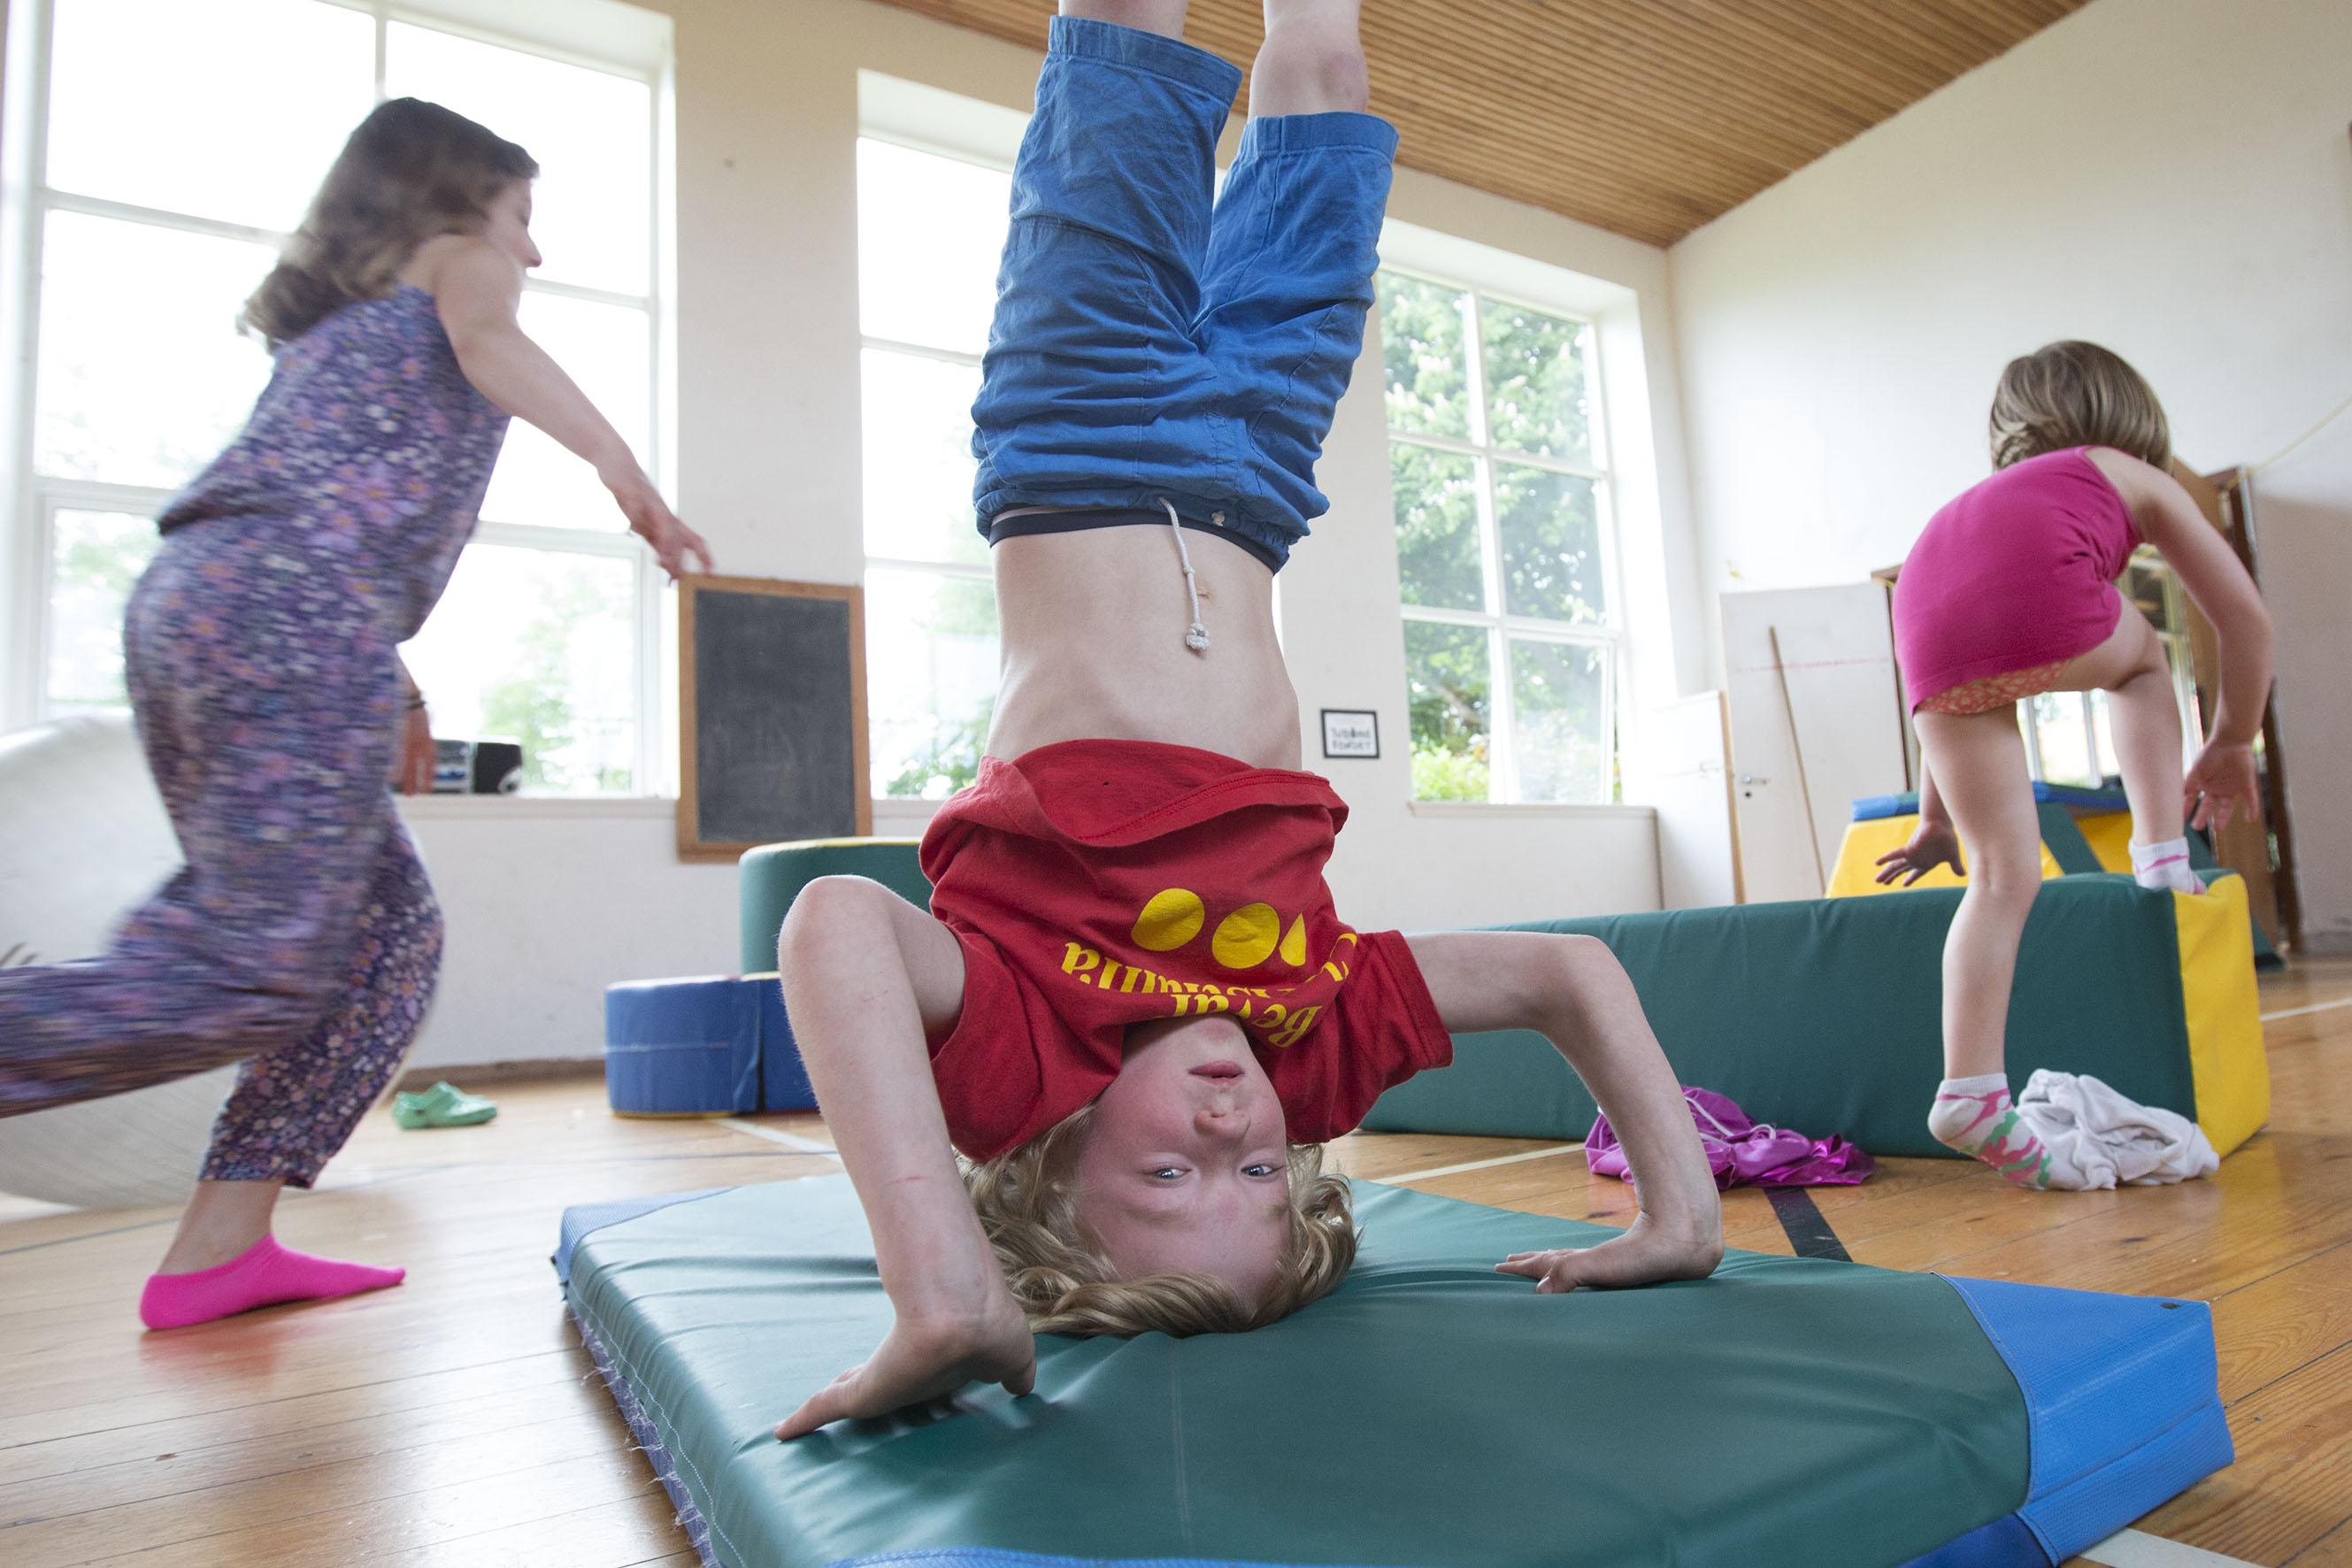 Tumling I Gymnastiksal